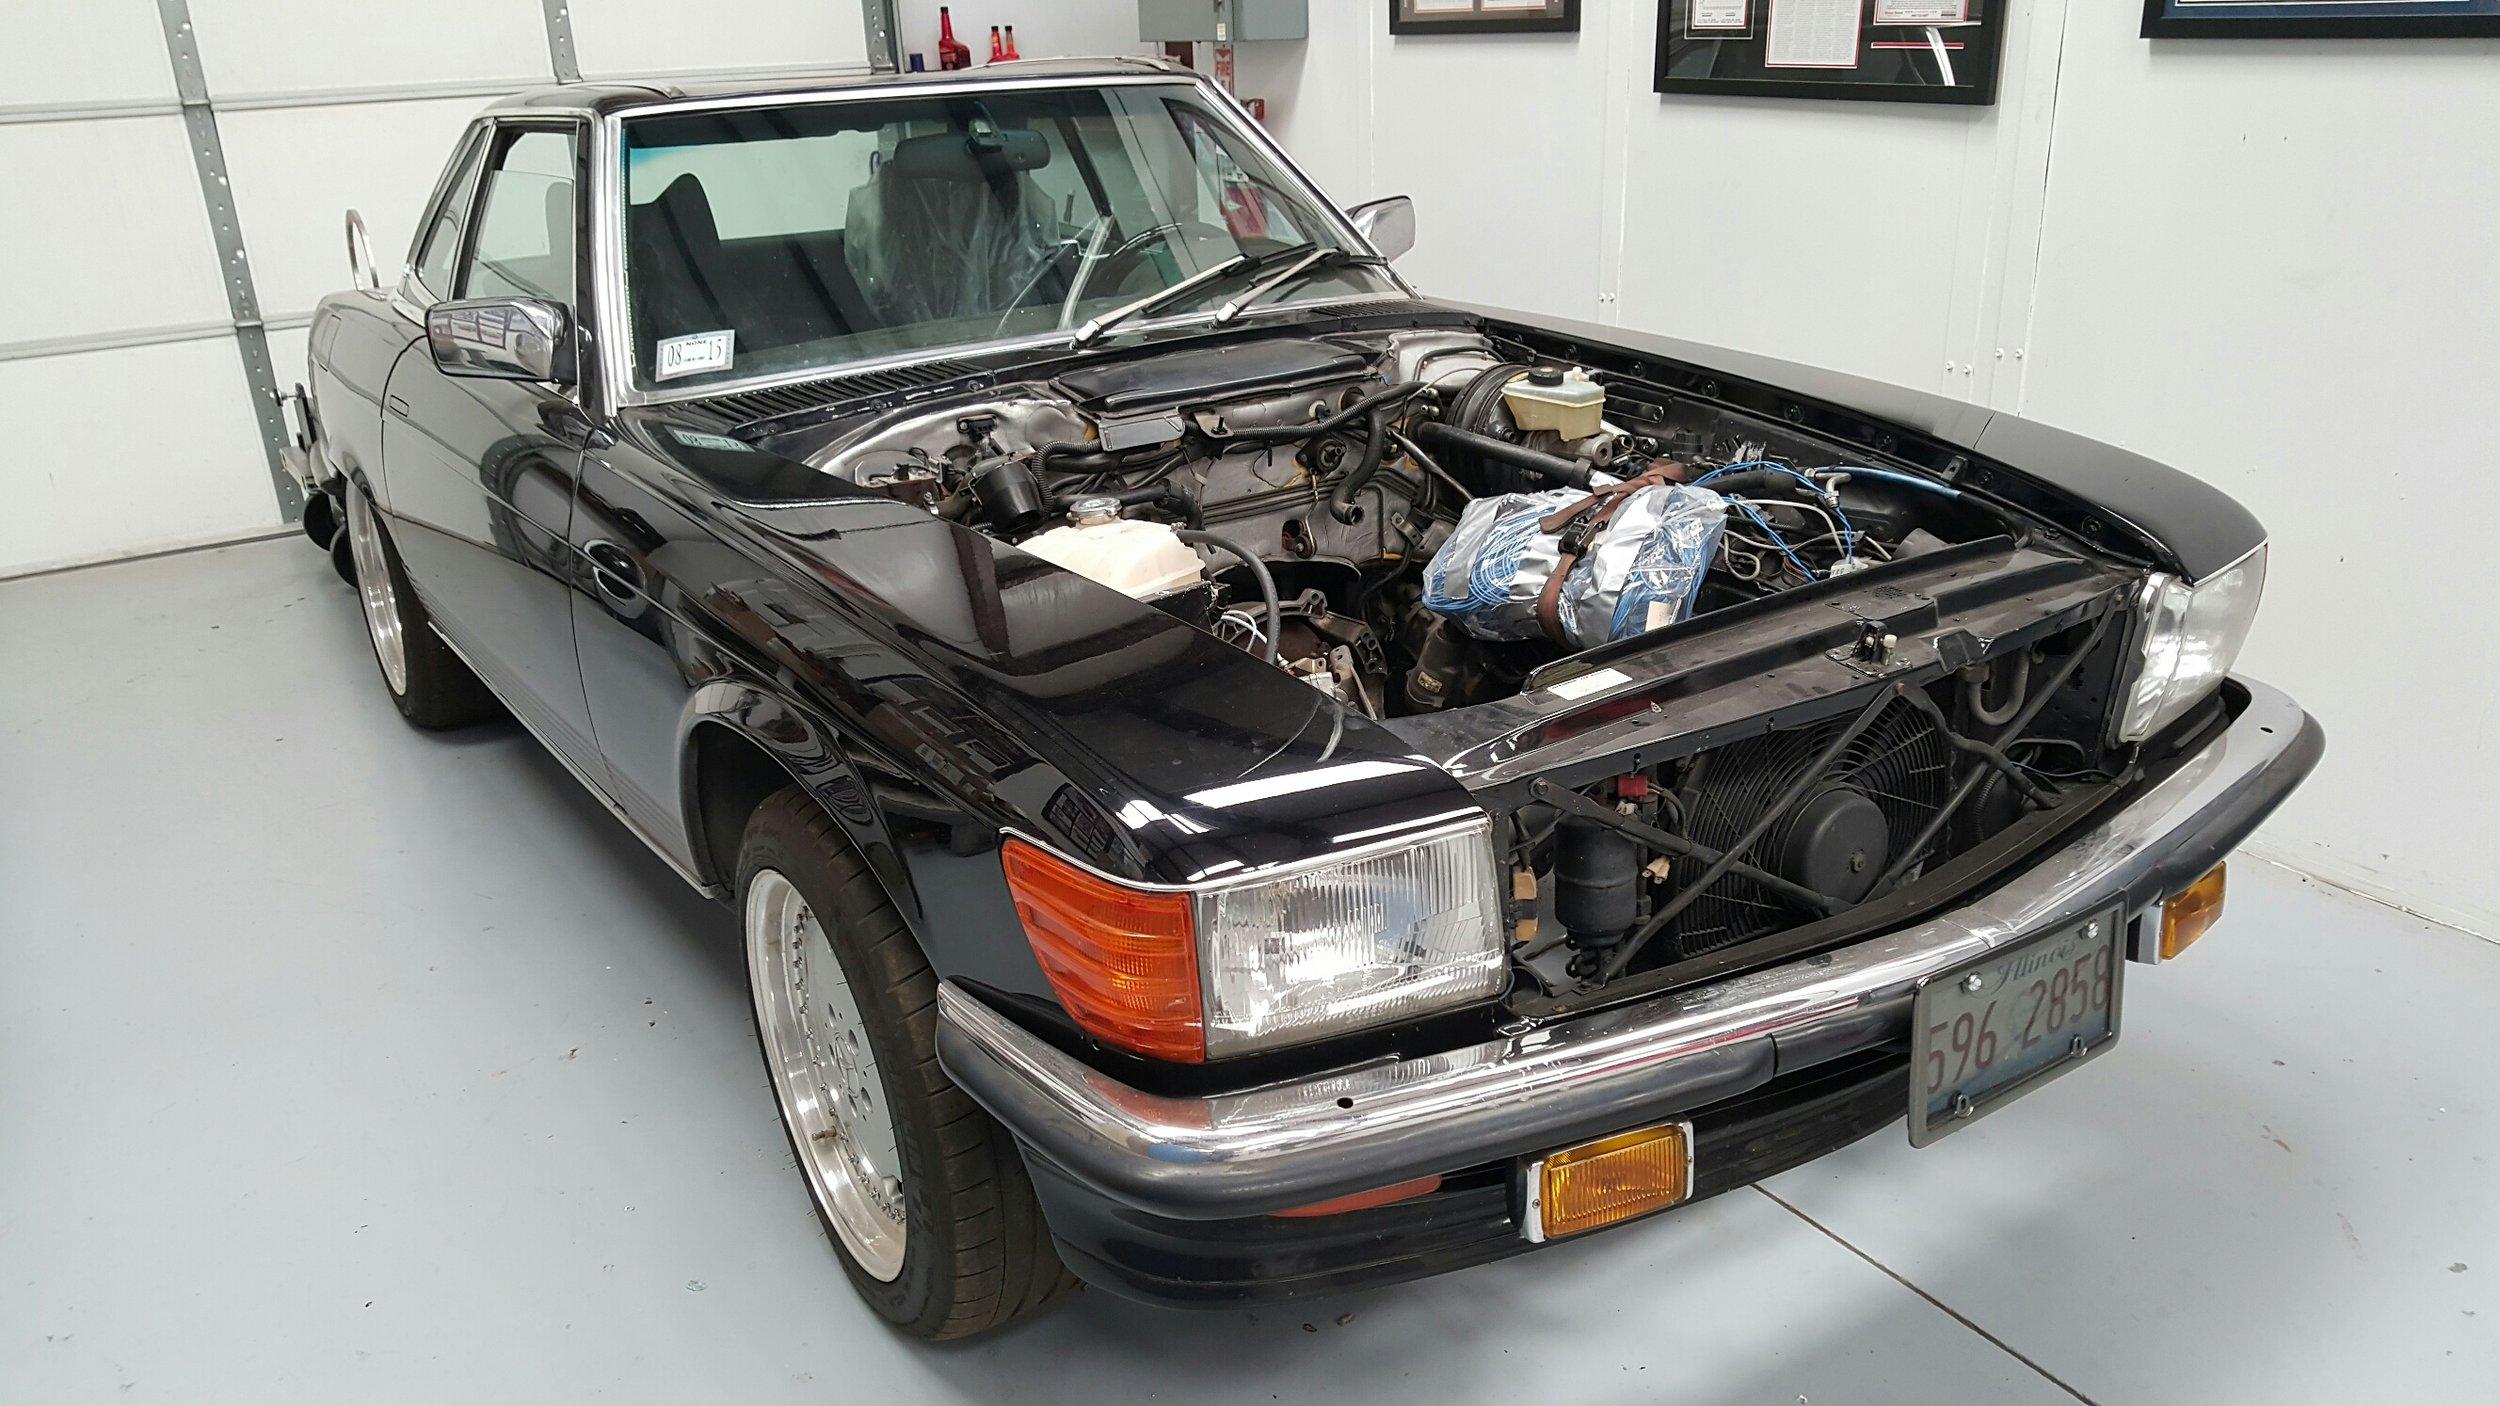 1986 Mercedes Benz 560sl Carobu High Performance Parts And Accessories For Ferrari